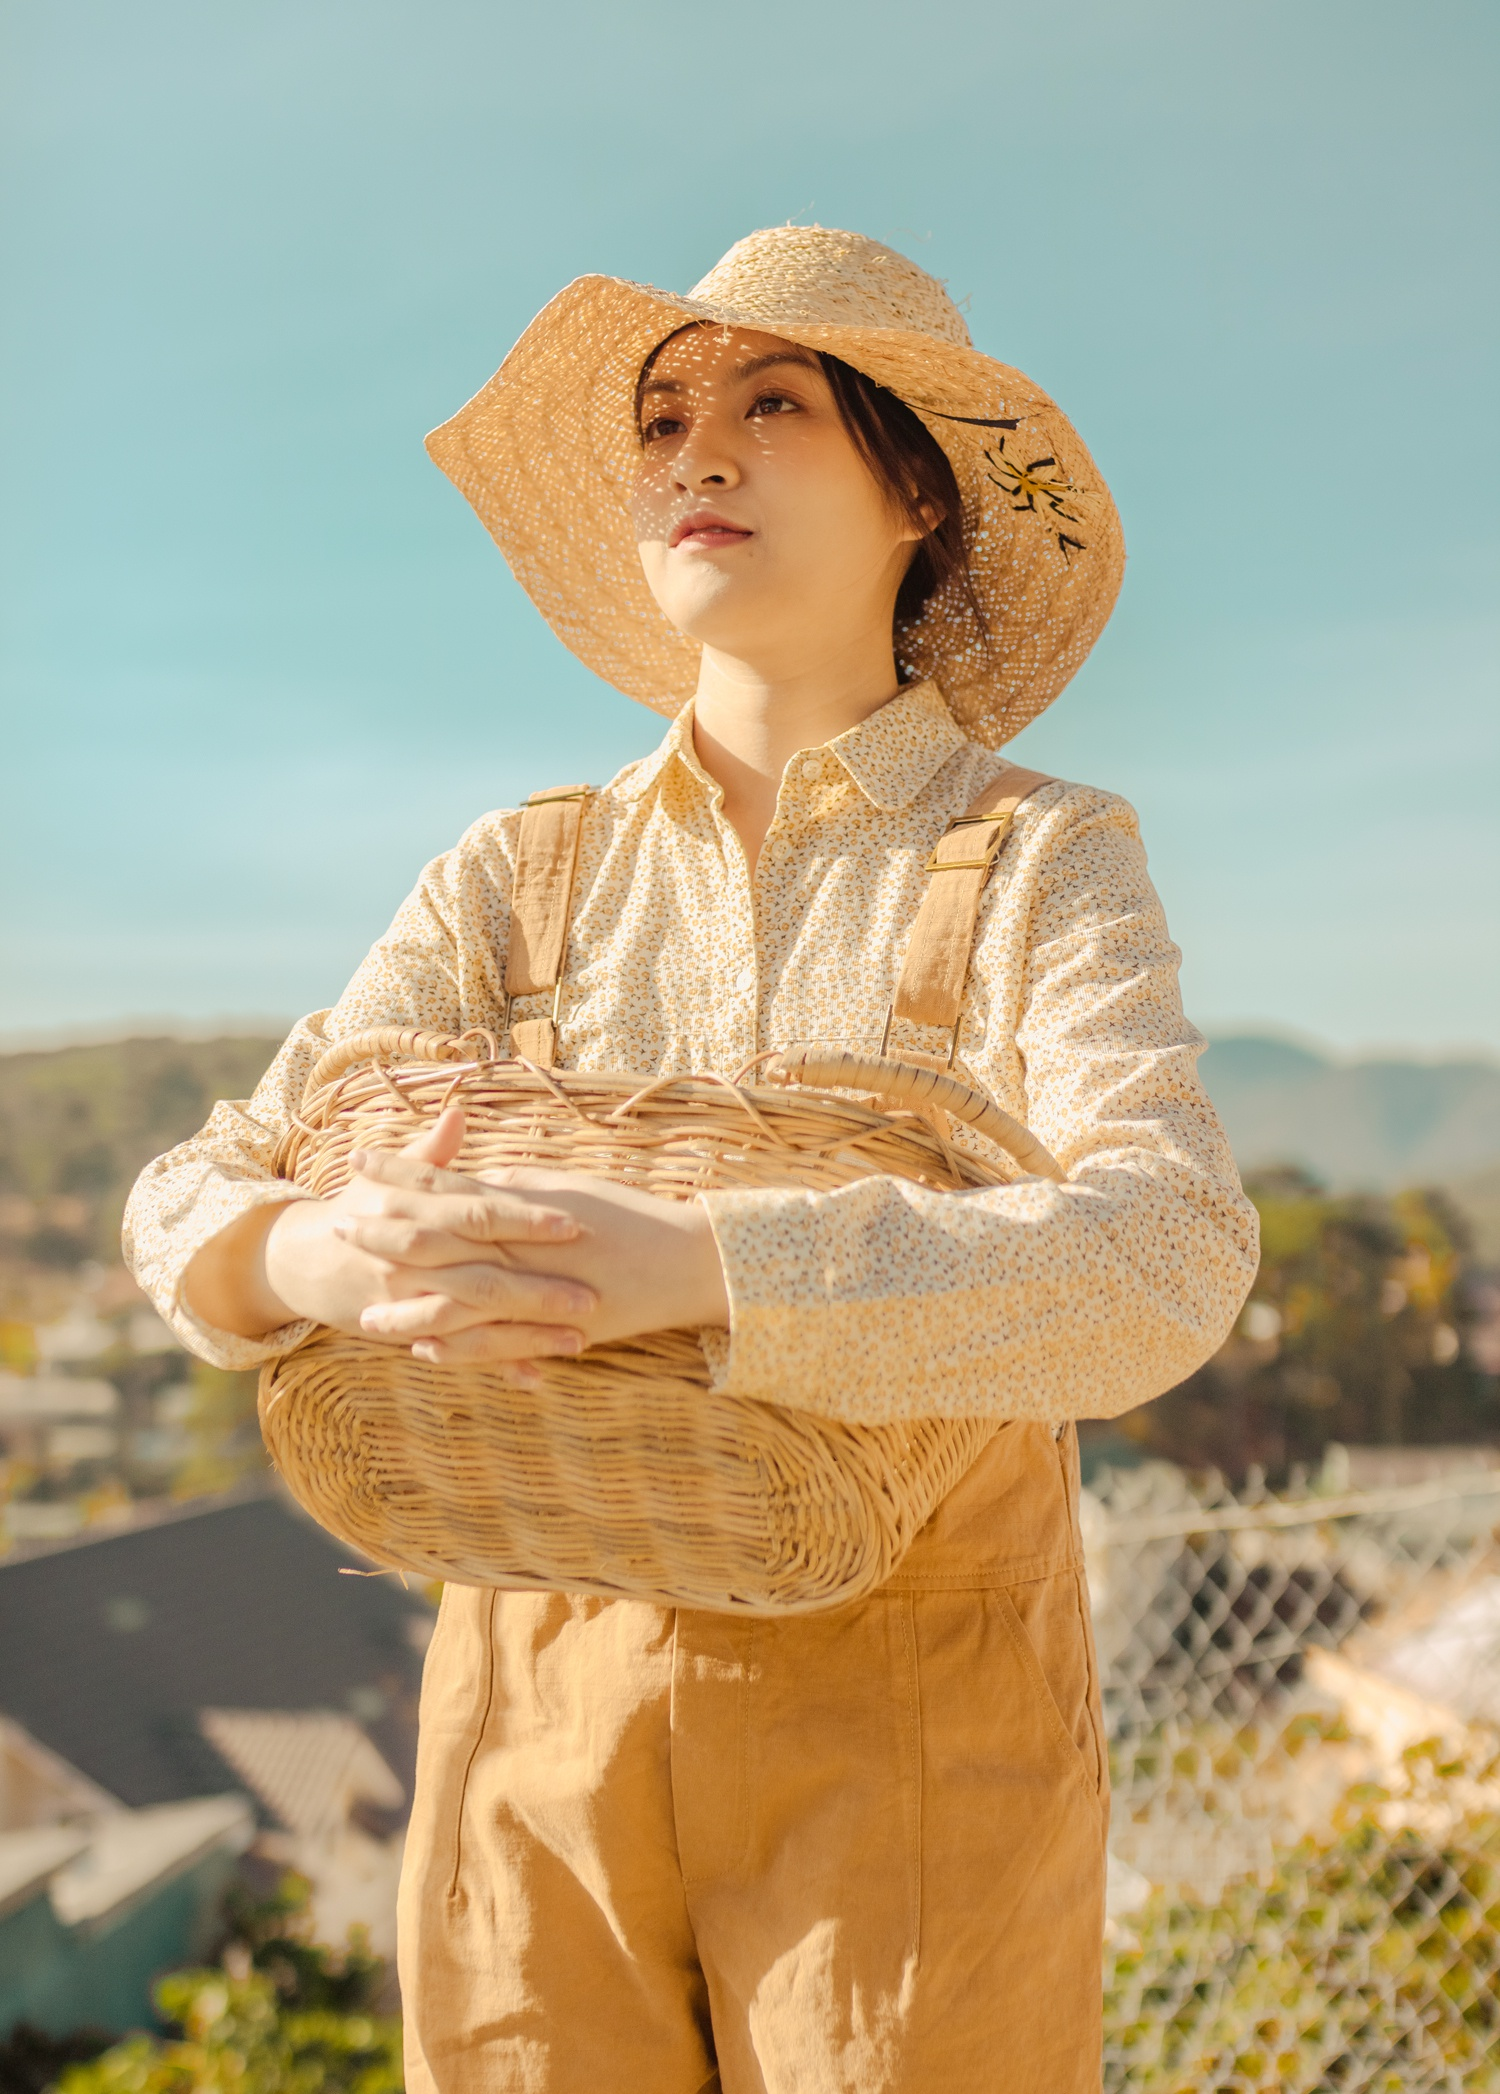 Nhan sac hot girl 'Mat biec' trong lan dau dong MV hinh anh 8 thao_tam8.jpg